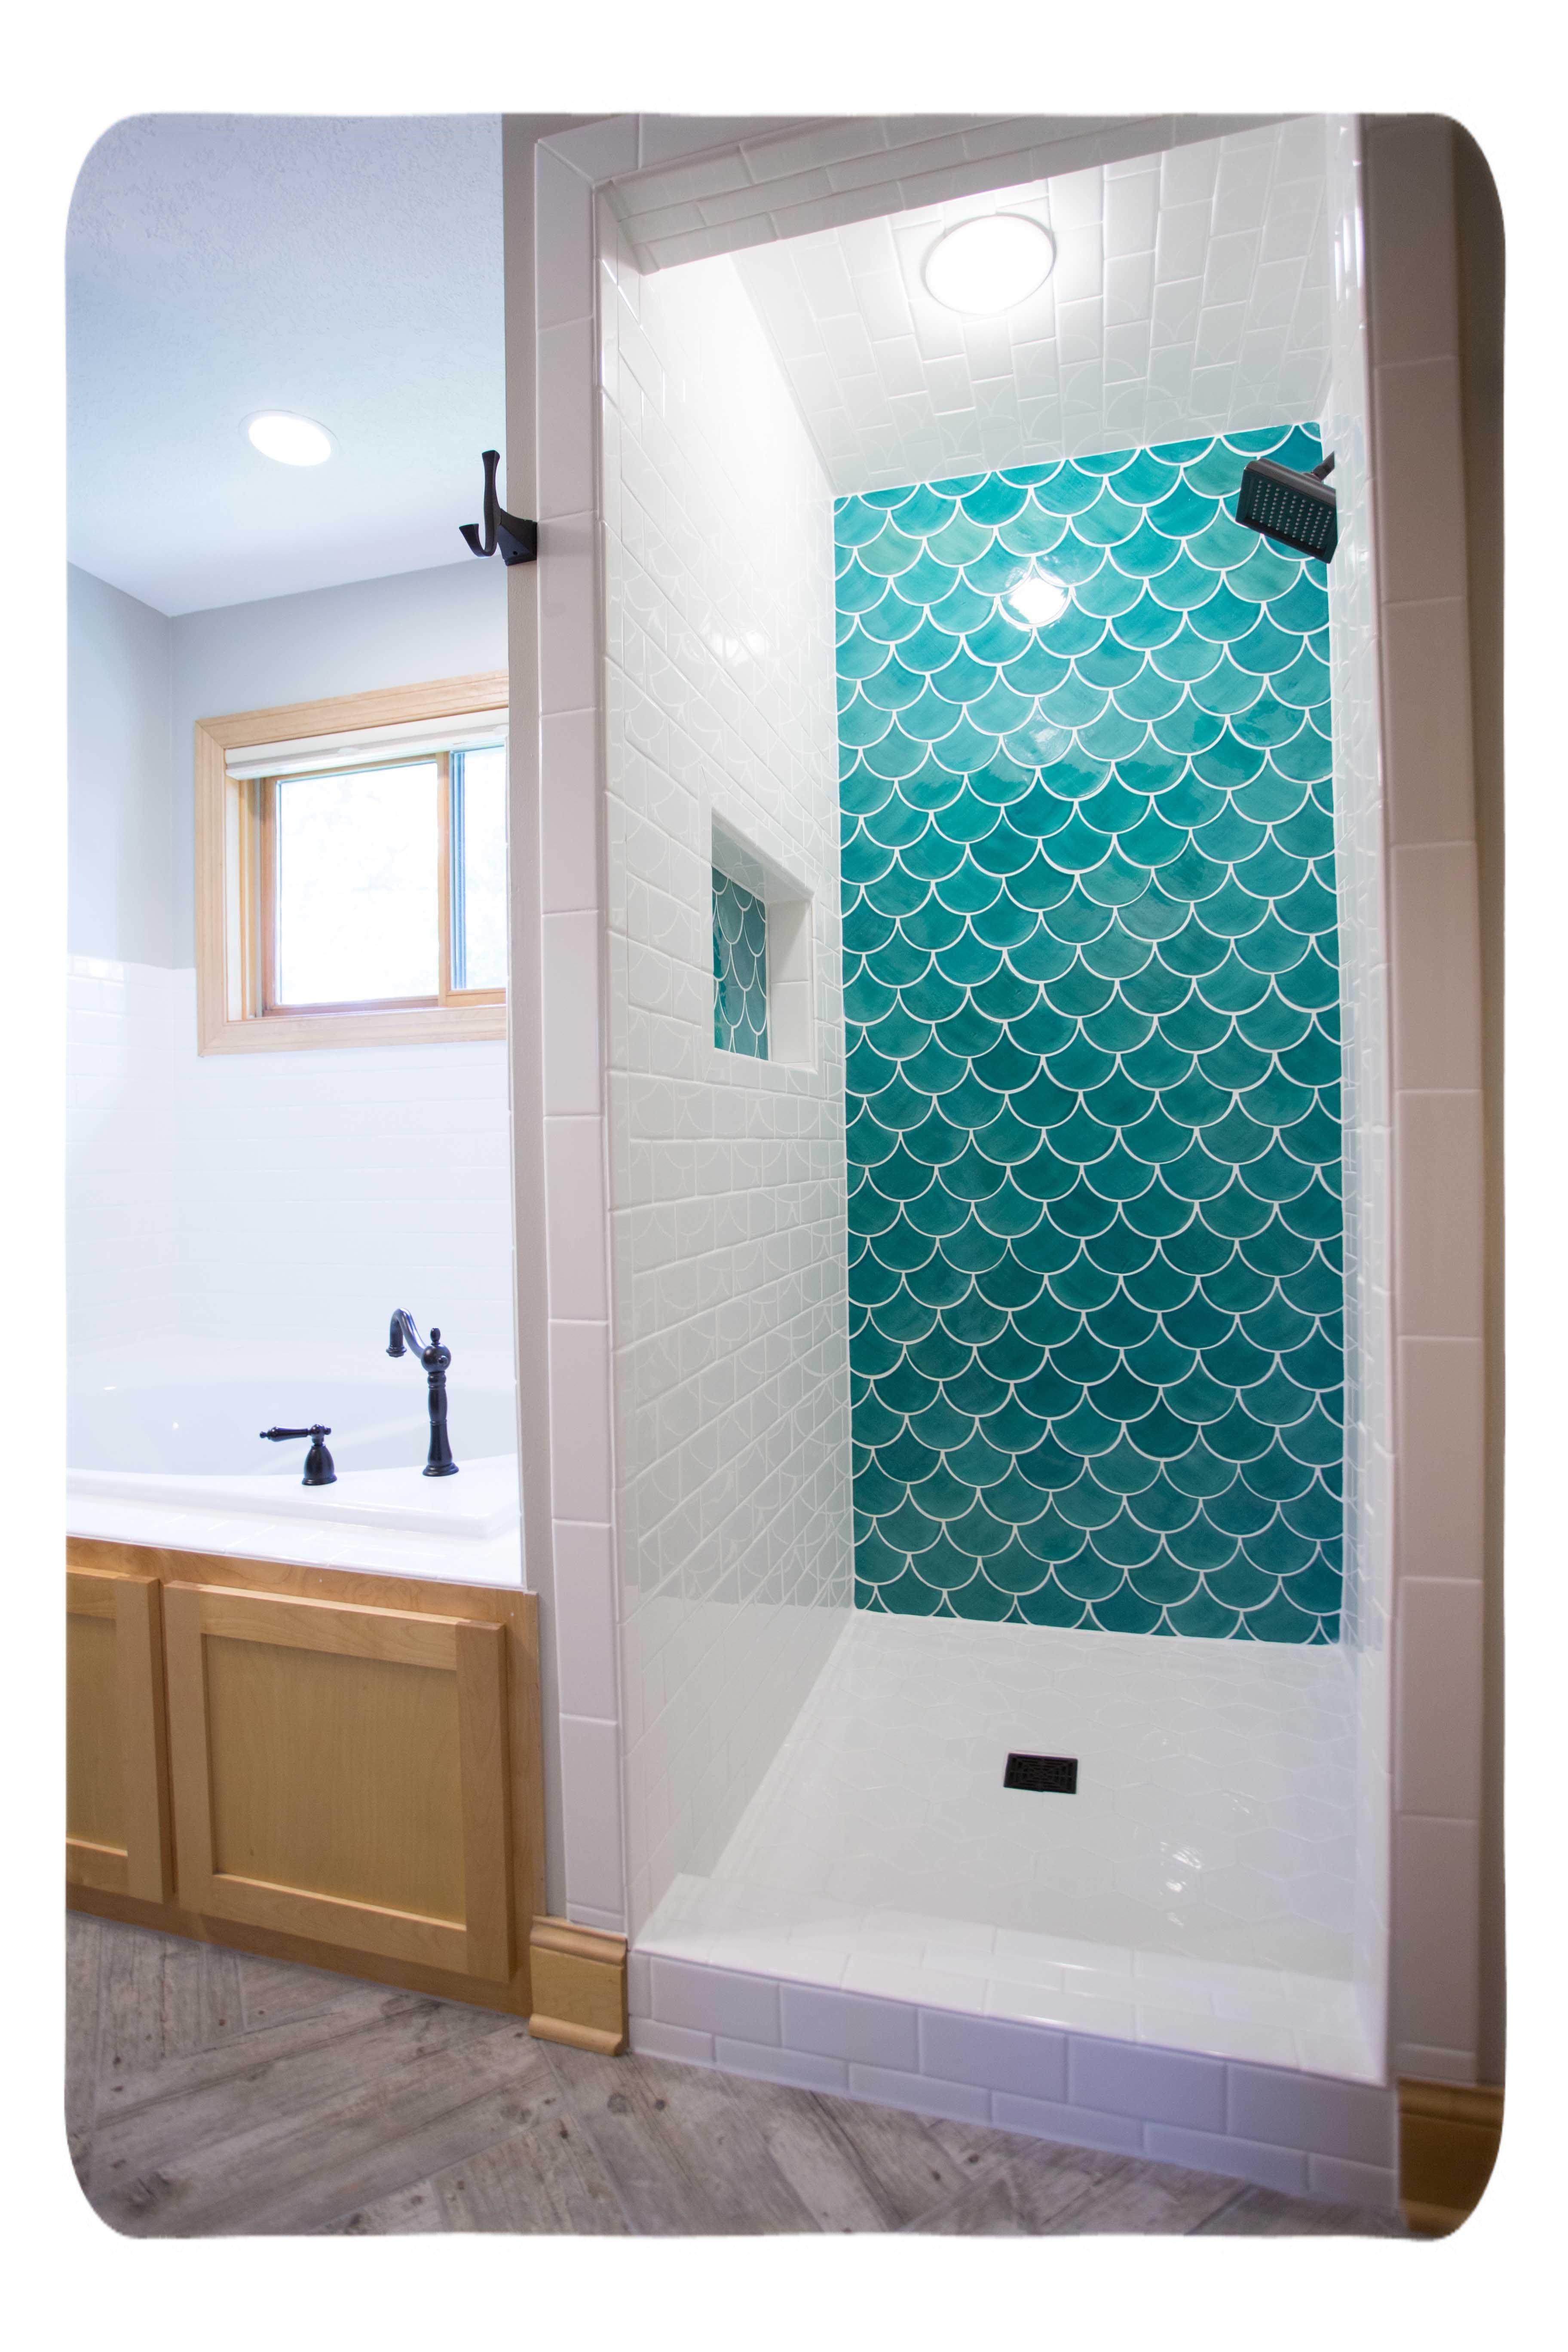 Bathroom Decor Generate A Splash With Your Bathroom Design By